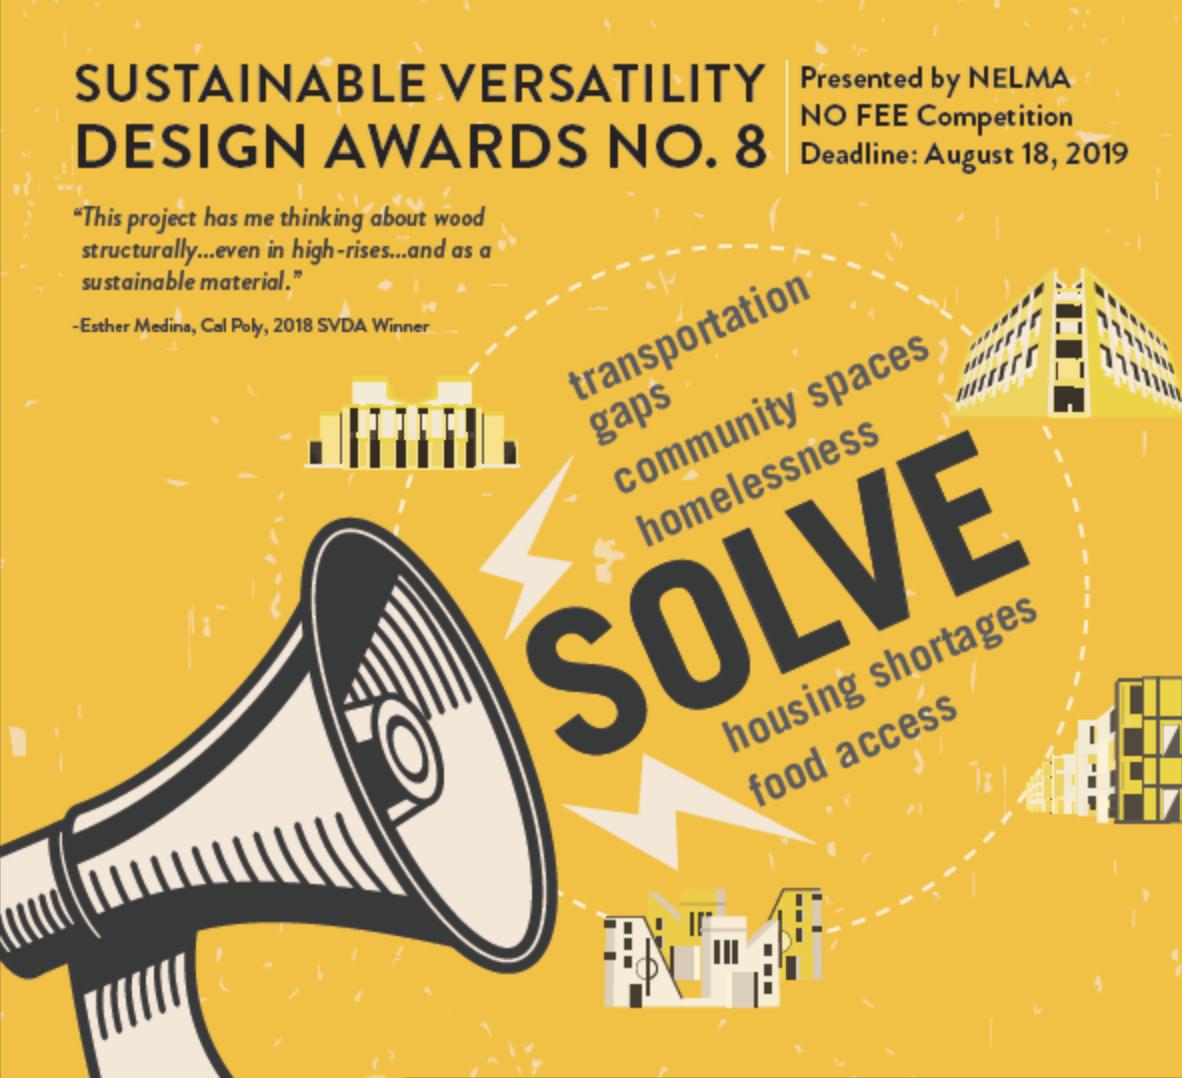 Sustainable Versatility Design Awards